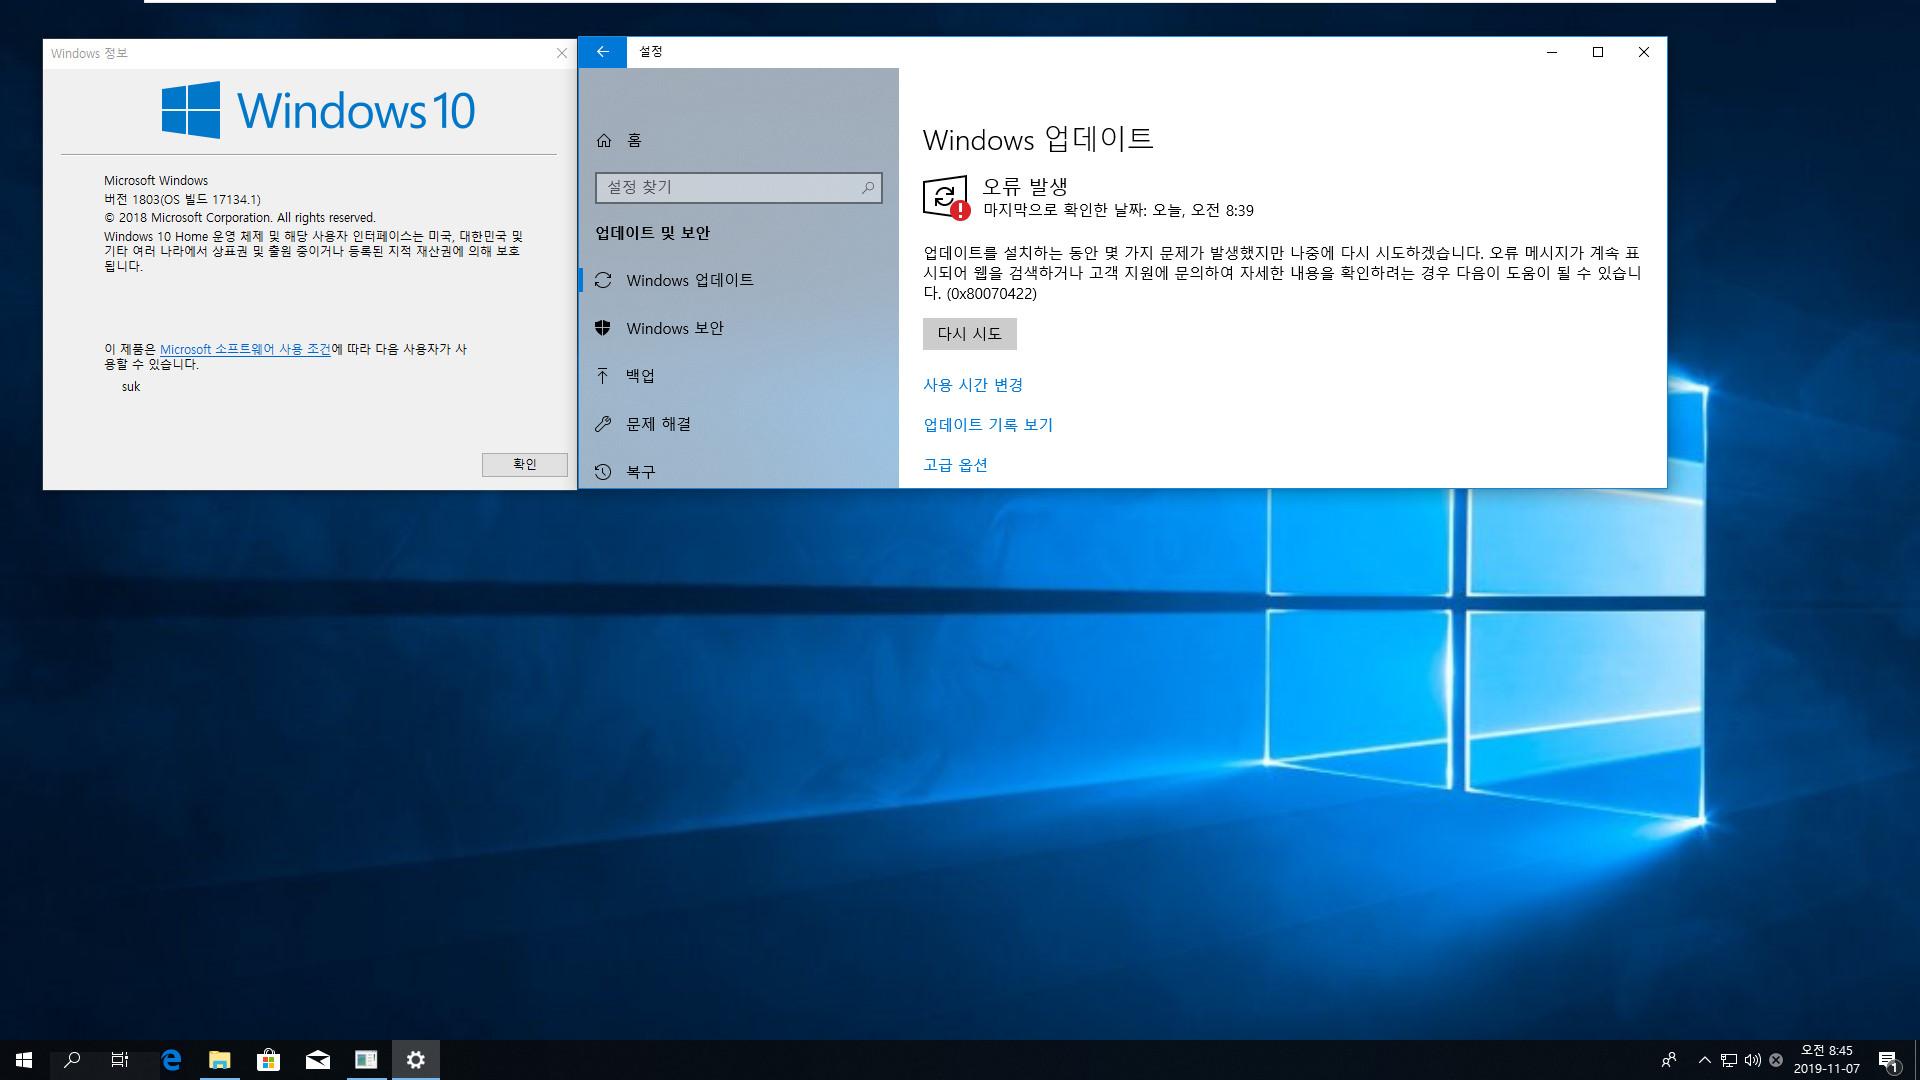 Windows 10 업데이트 방지하기 [업데이트 다운로드 폴더 사용 금지].bat 테스트 - 버전 1803, Home 에서 버전 1903 기능 업데이트 방지하기 2019-11-07_084552.jpg